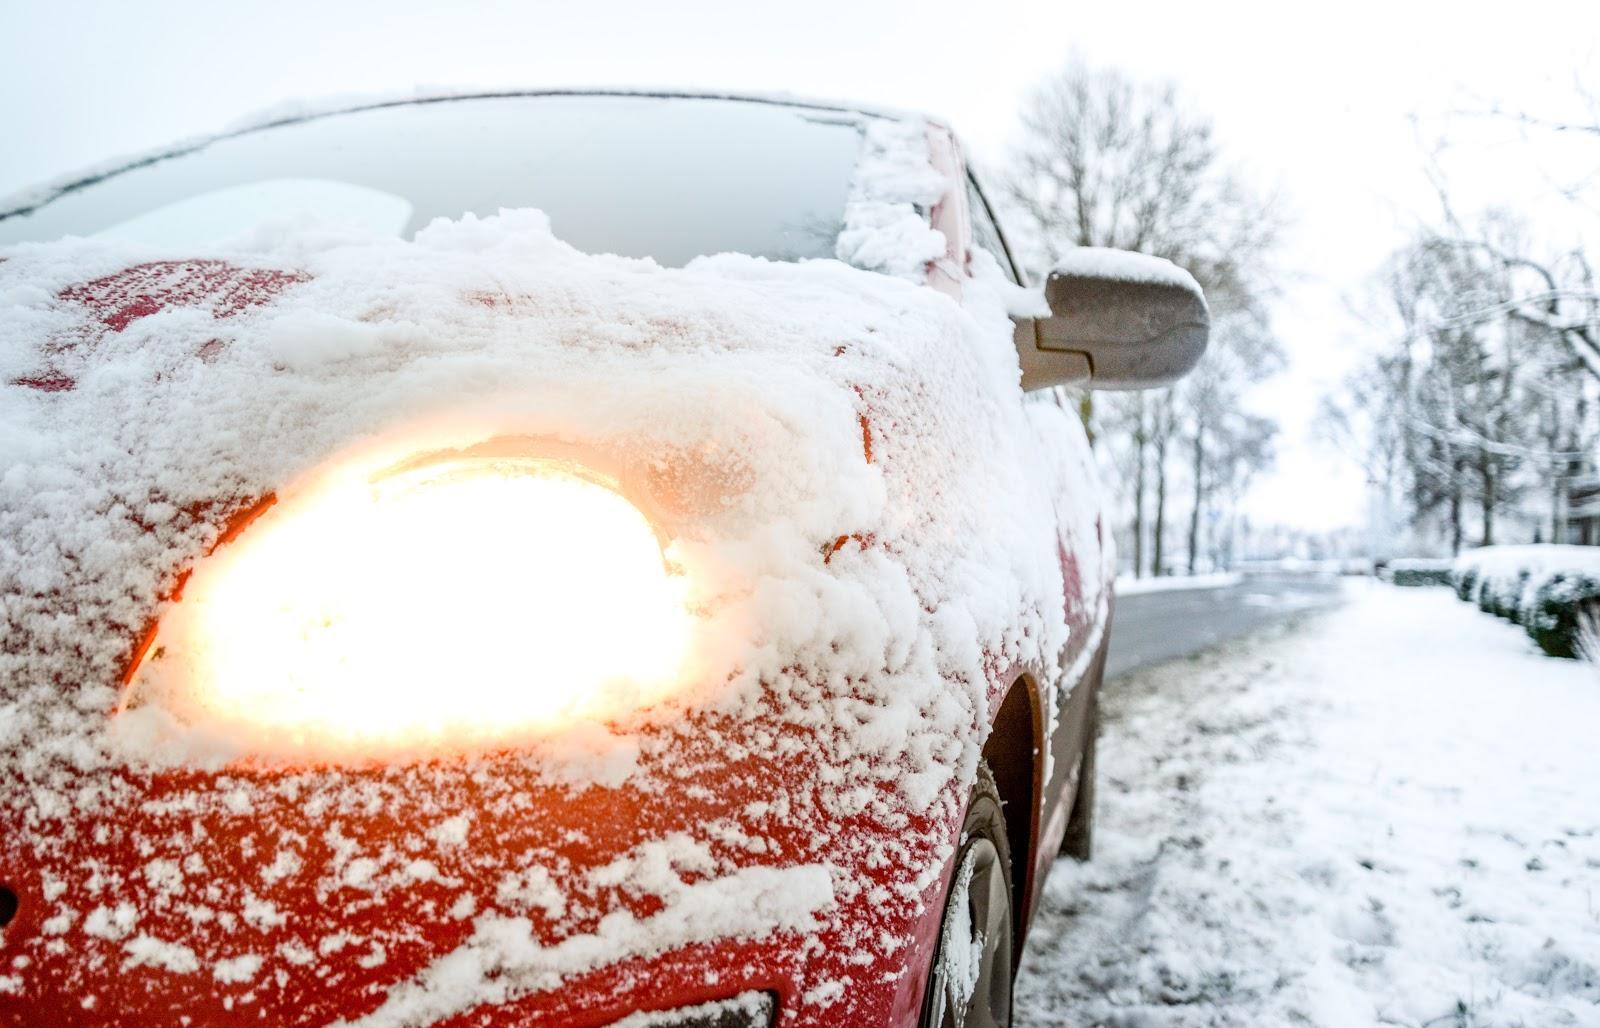 snowy windshield